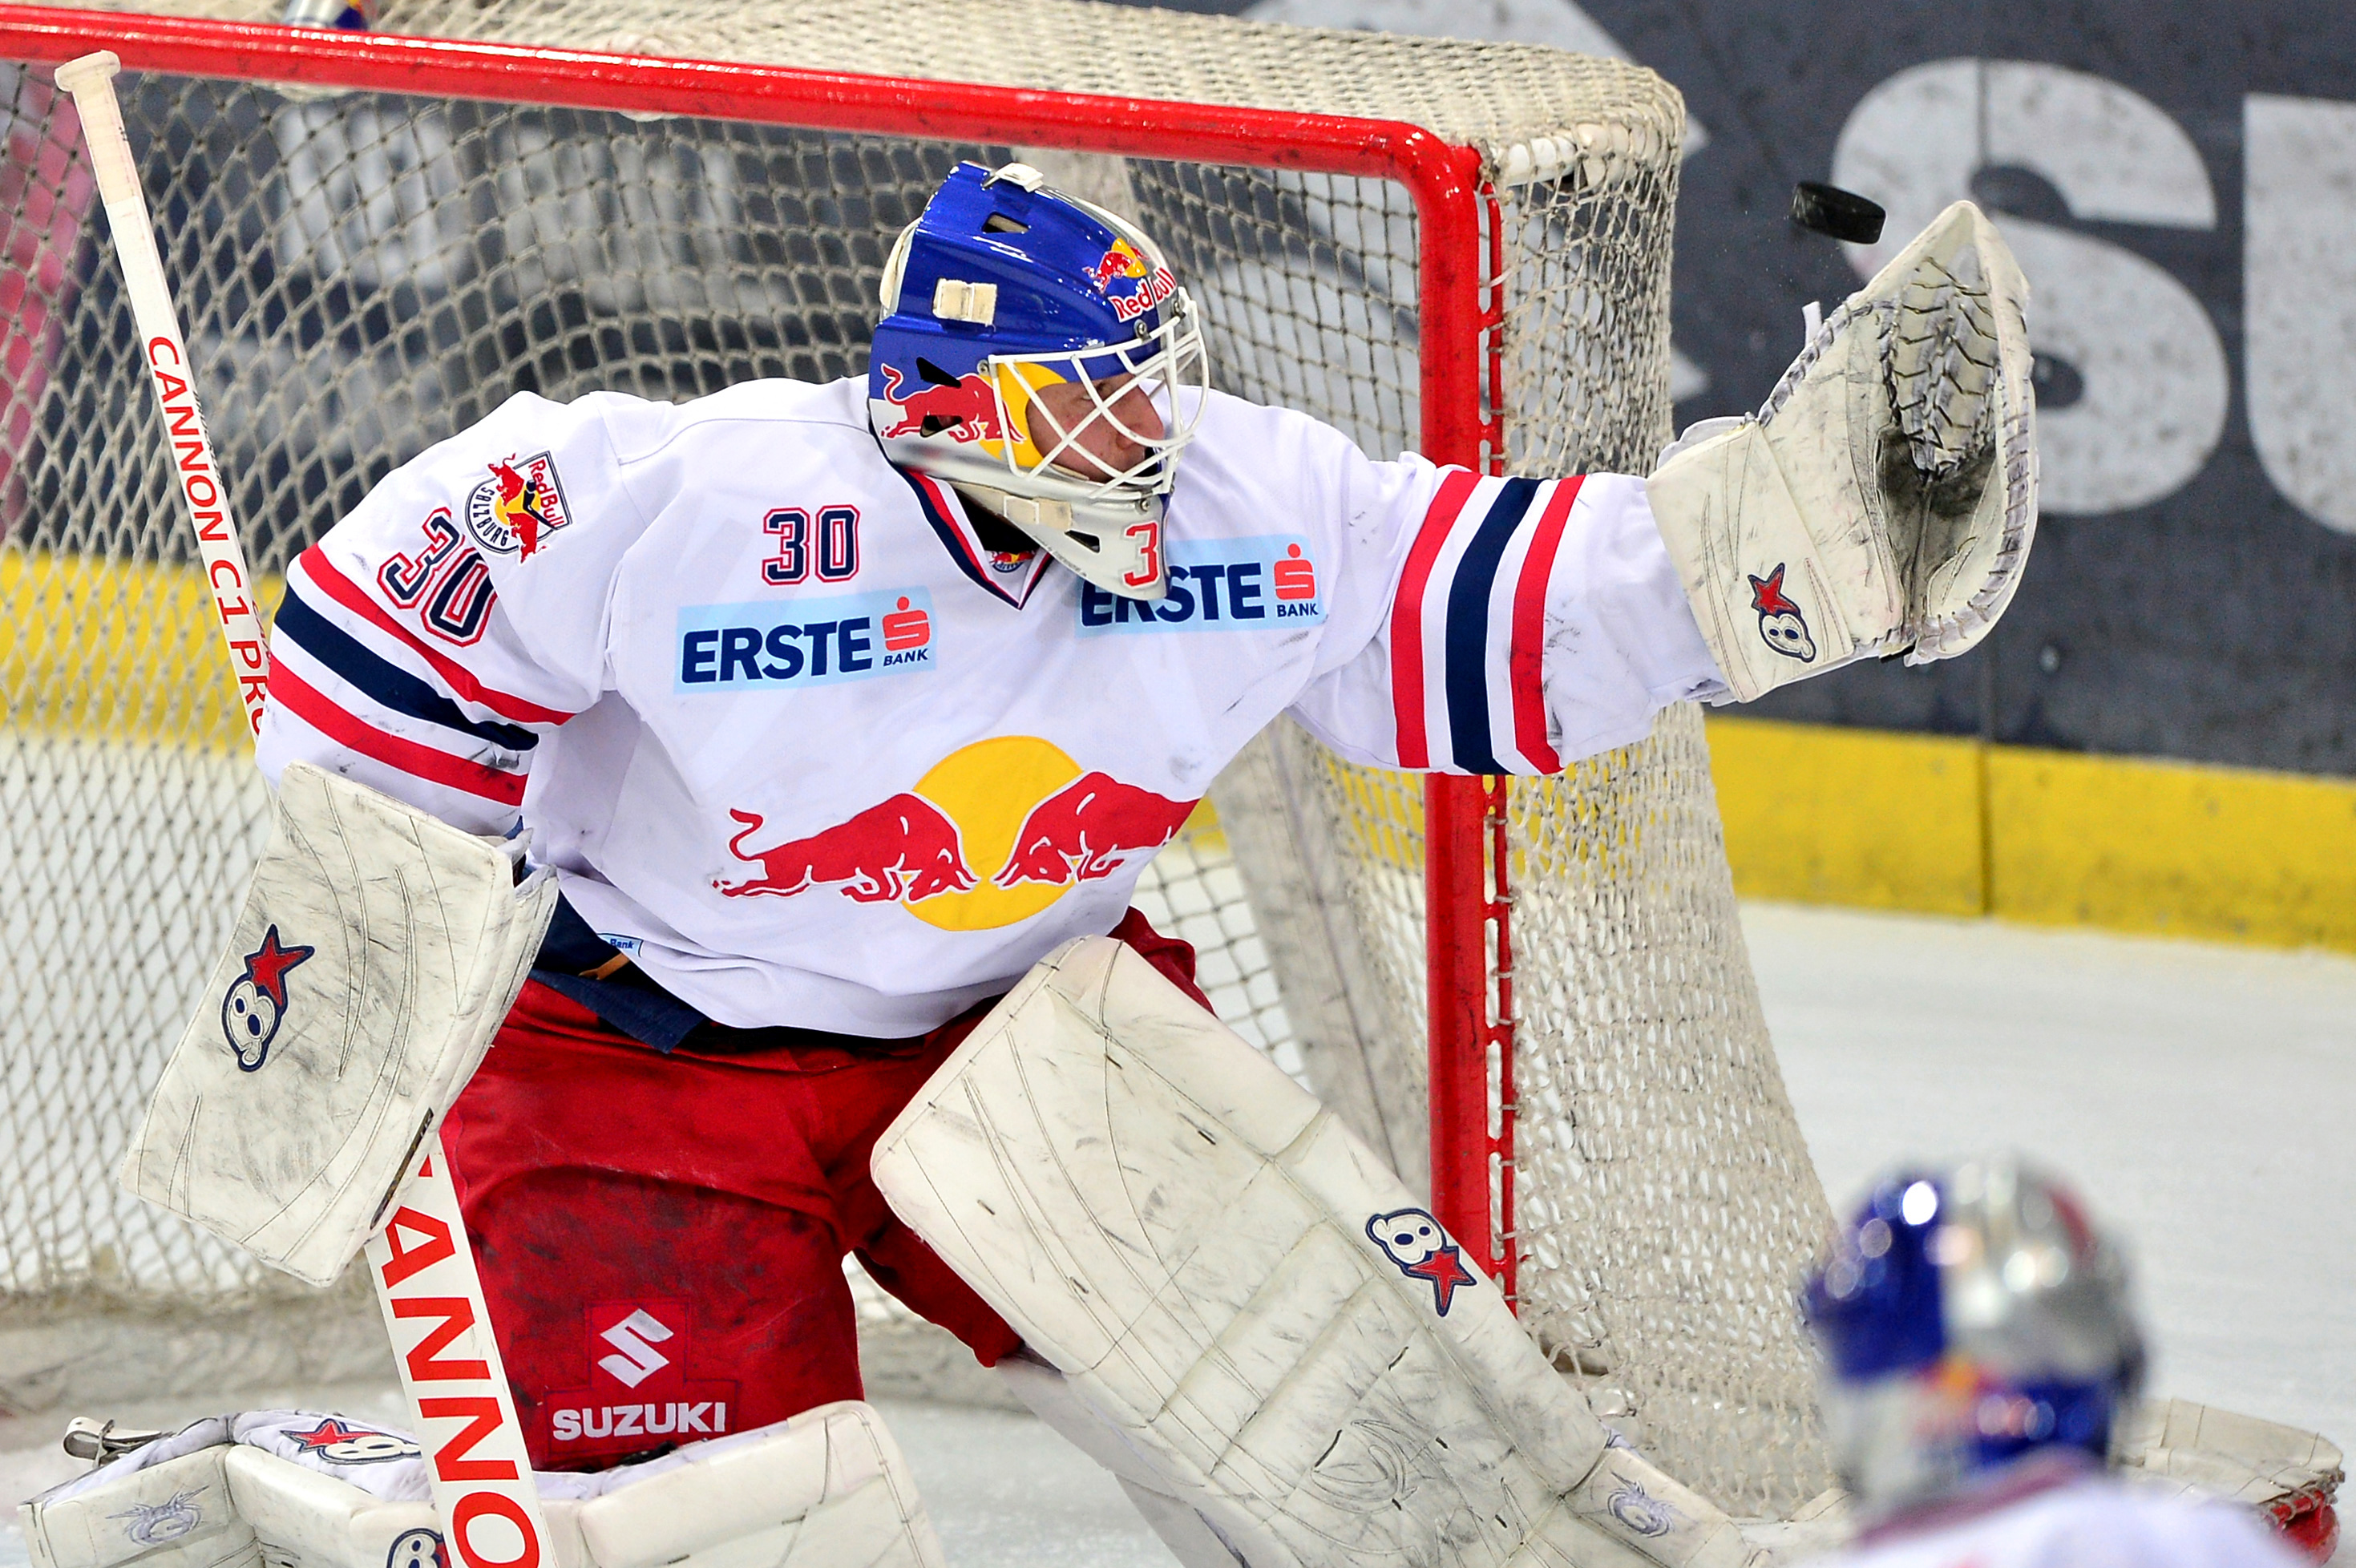 ICE HOCKEY – EC RBS vs Znojmo